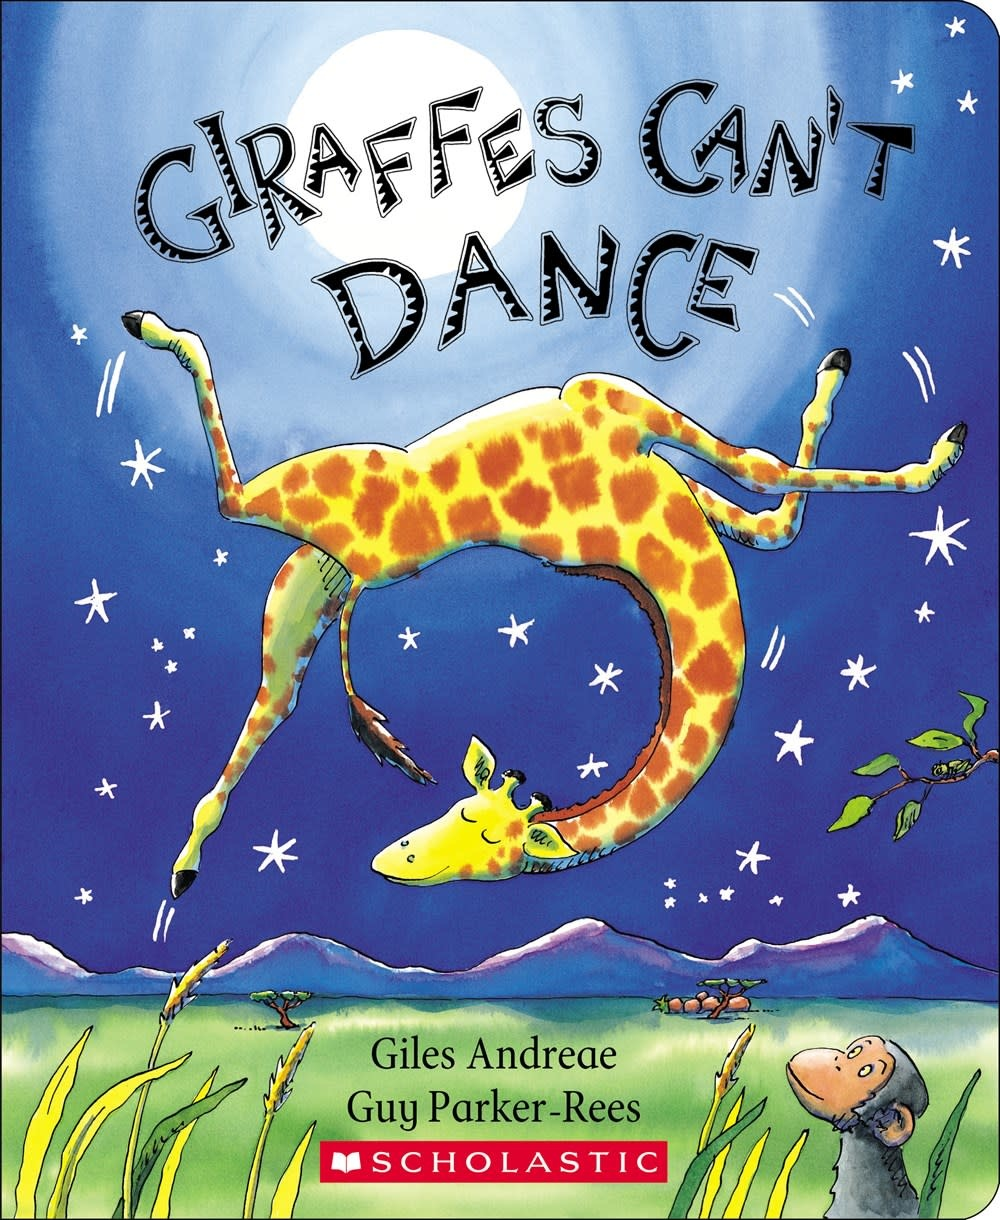 Cartwheel Books Giraffes Can't Dance